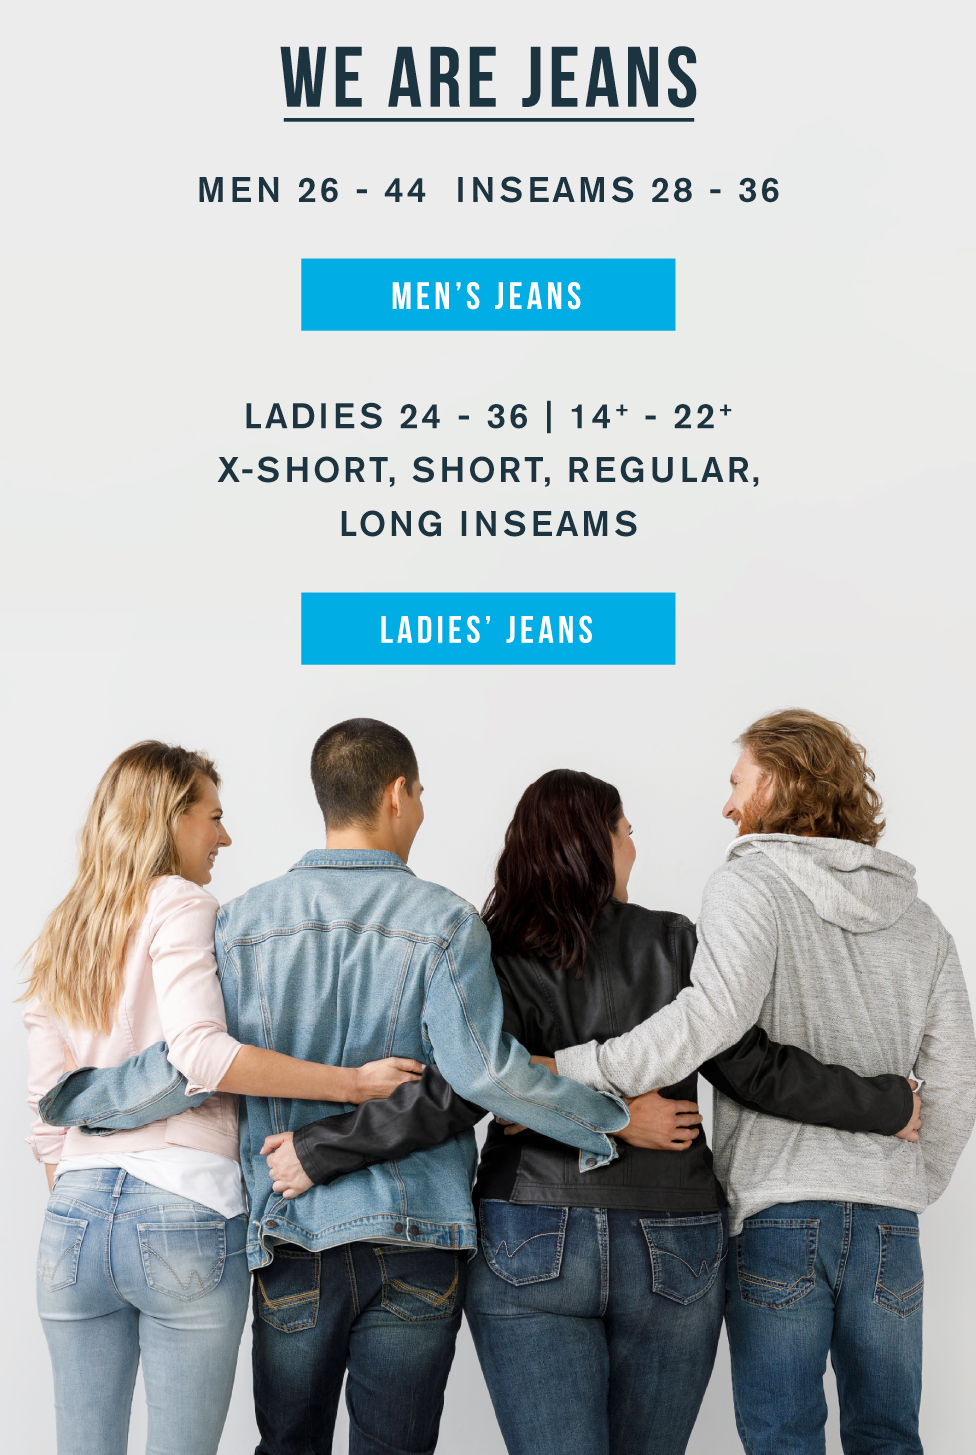 We are jeans. Men 26 - 44. Inseams 28 - 36. Men's jeans. Ladies 24 - 36 and 14+ - 22+. X-short, short, regular, long inseams. Ladies' jeans.